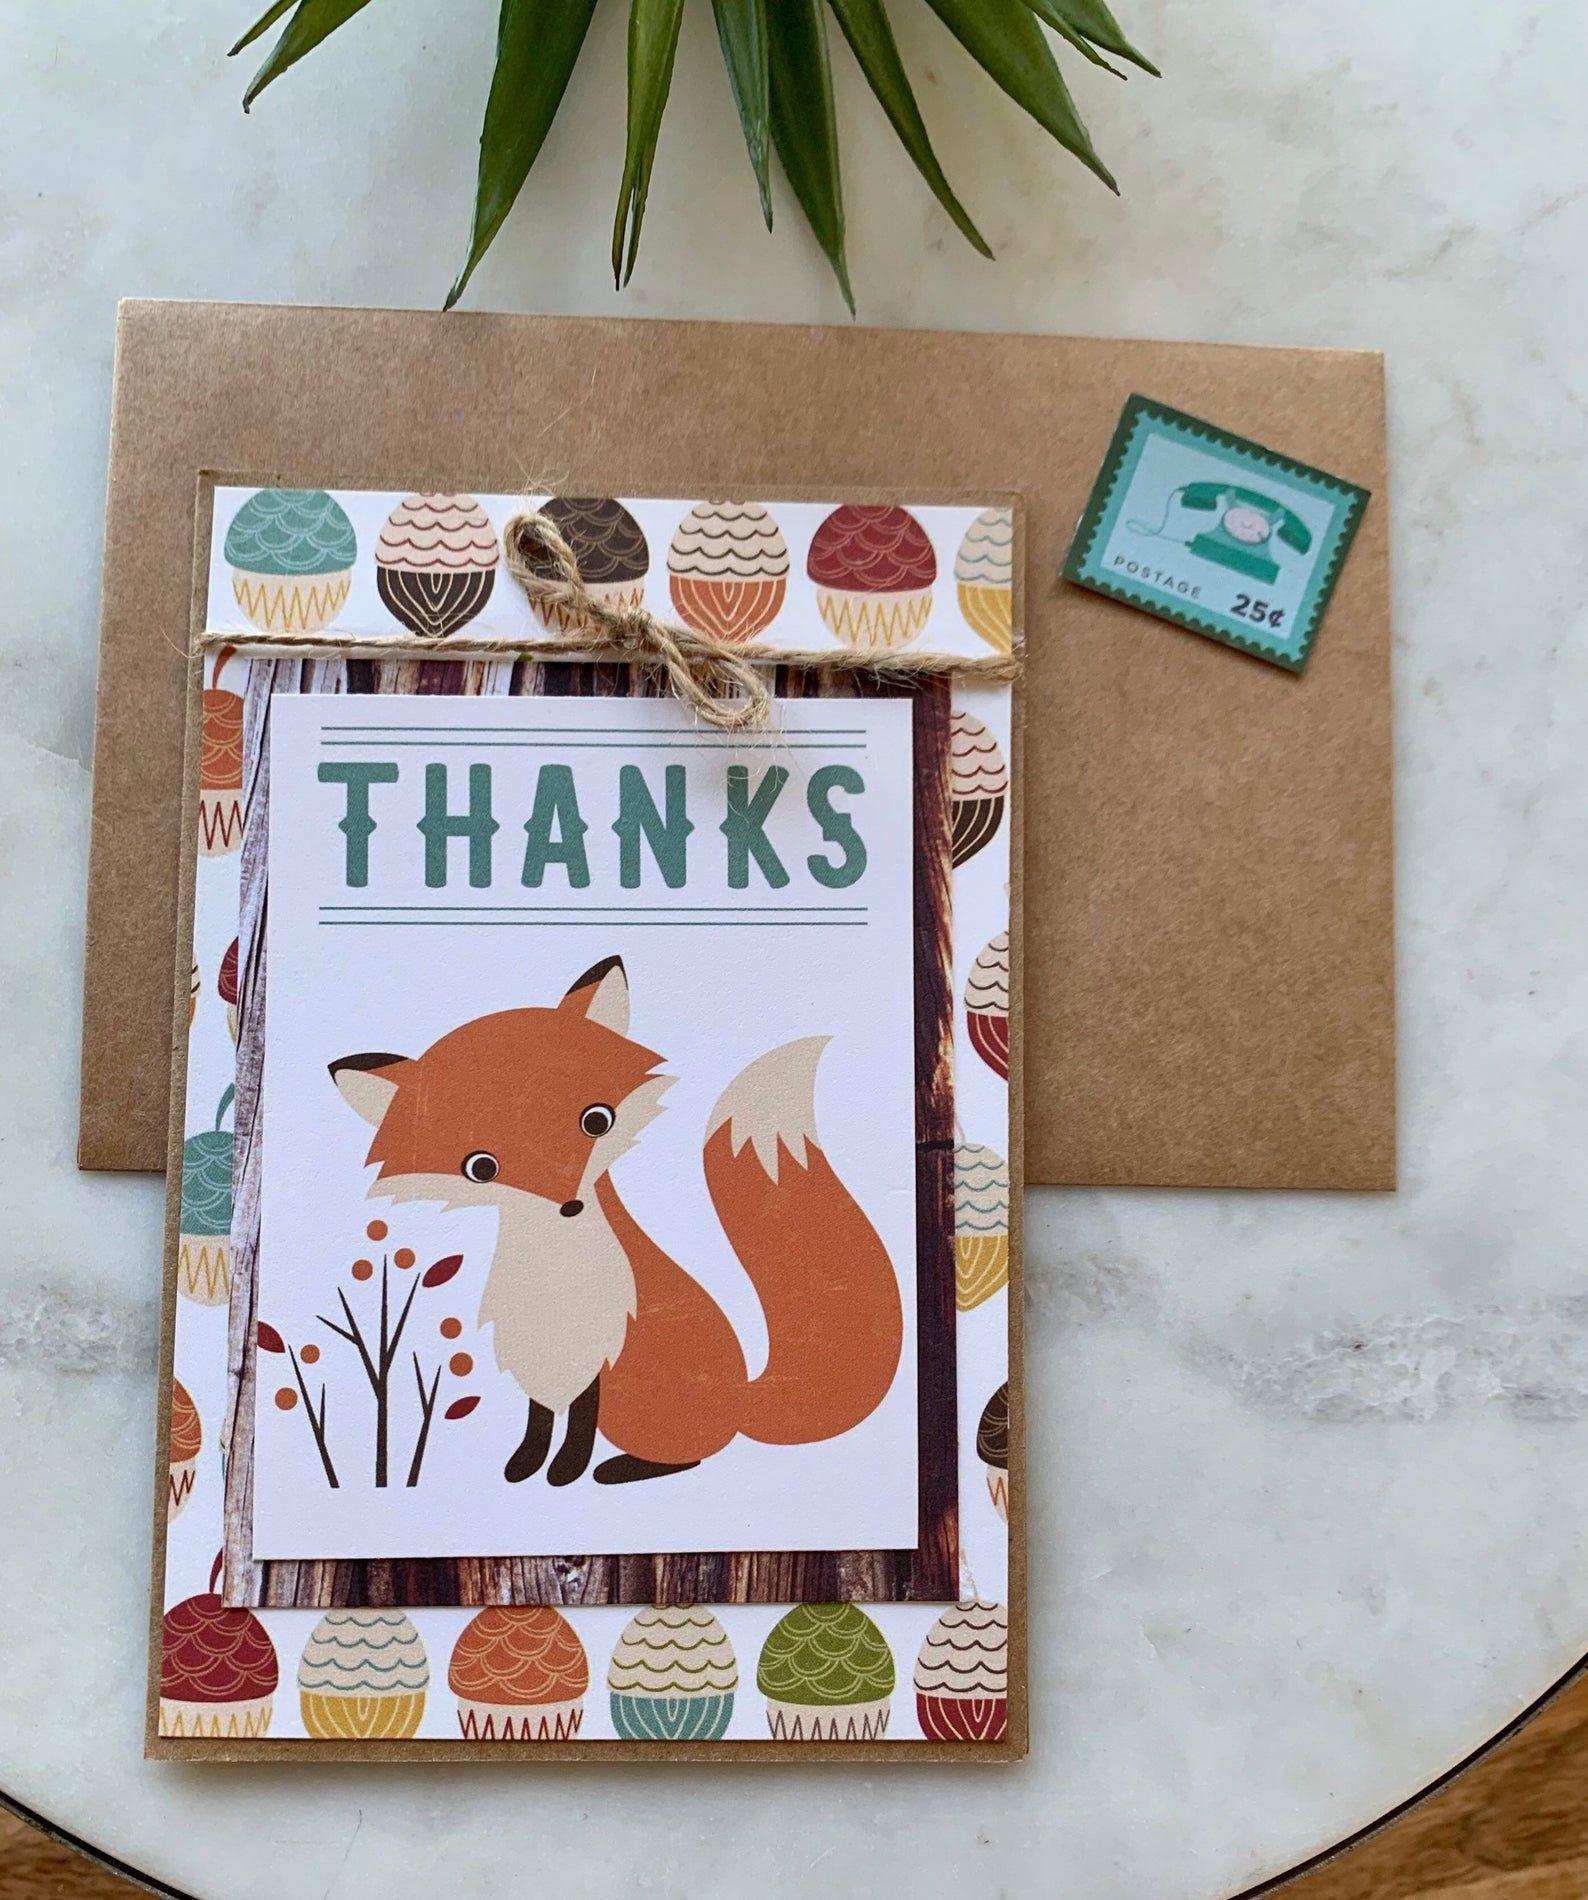 Handmade Fox Thanks Card Blank Inside 4x6 Kraft Paper Card Etsy In 2021 Thanks Card Blank Cards Cards